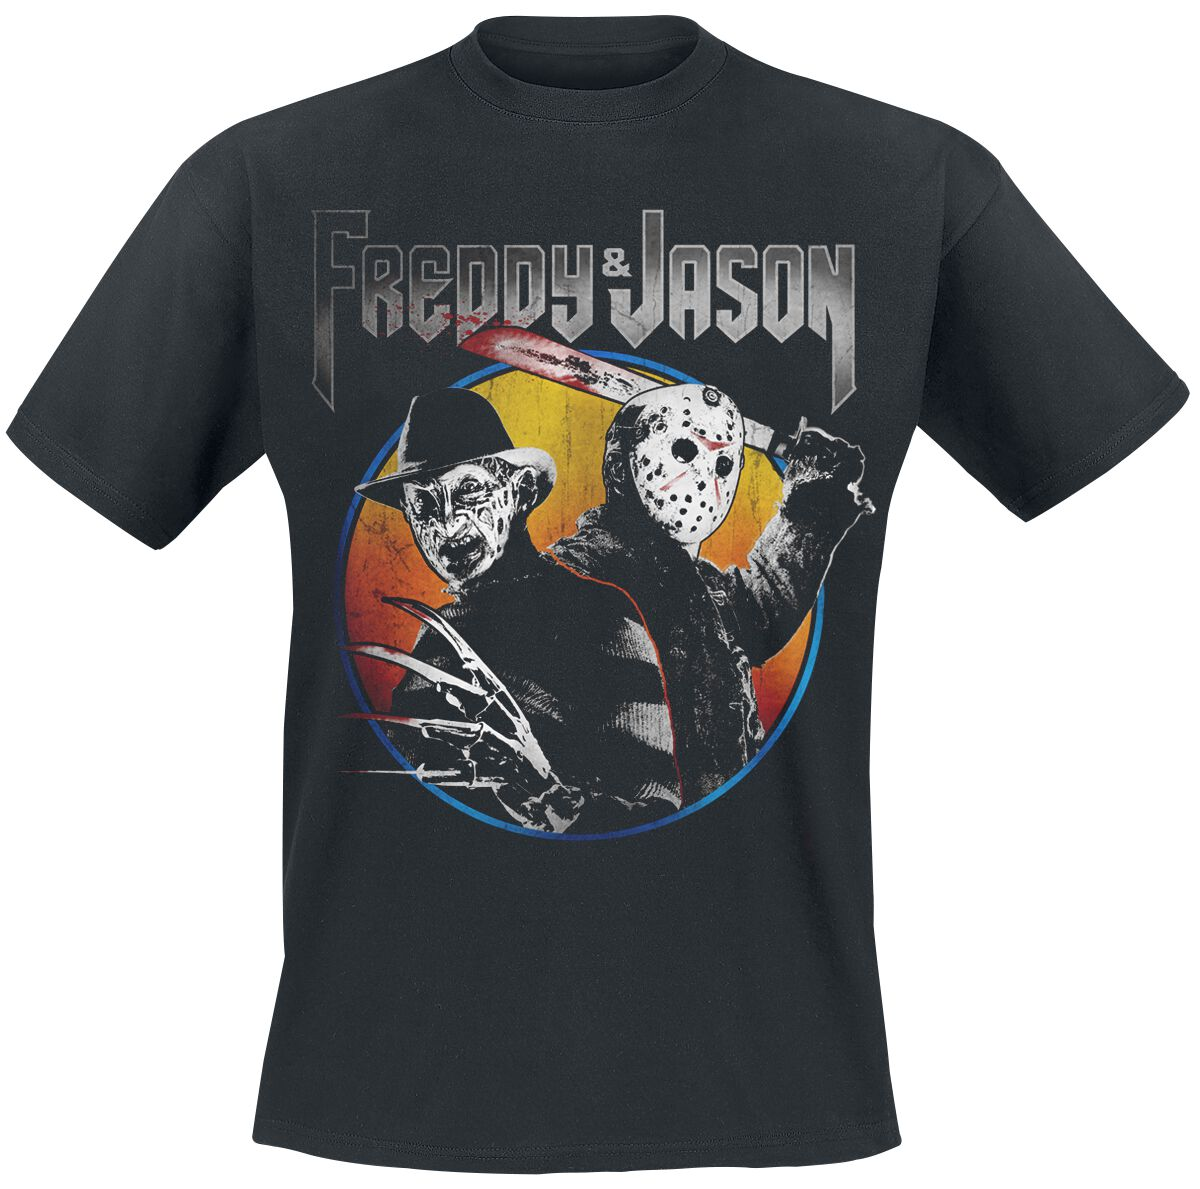 Merch dla Fanów - Koszulki - T-Shirt Freddy vs. Jason Concert T-Shirt czarny - 377535